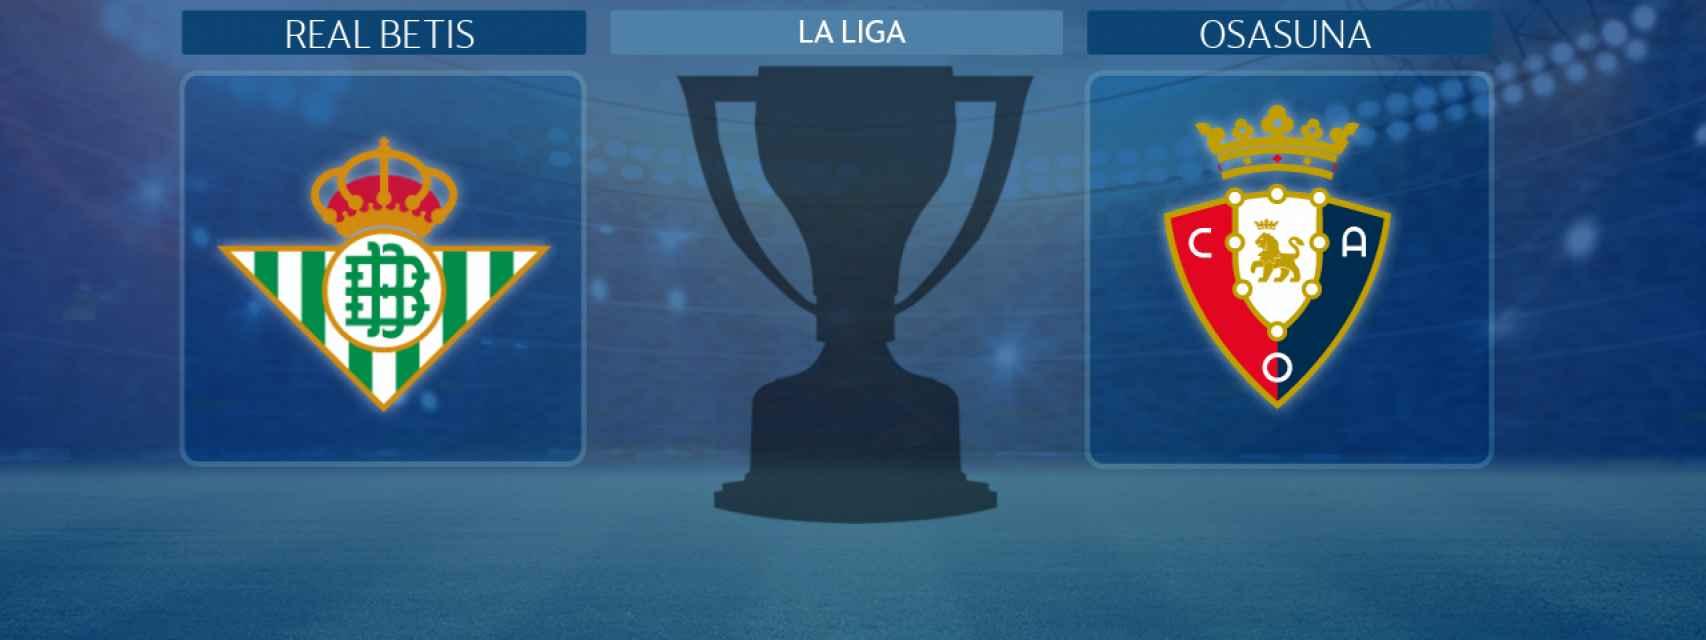 Real Betis - Osasuna, partido de La Liga